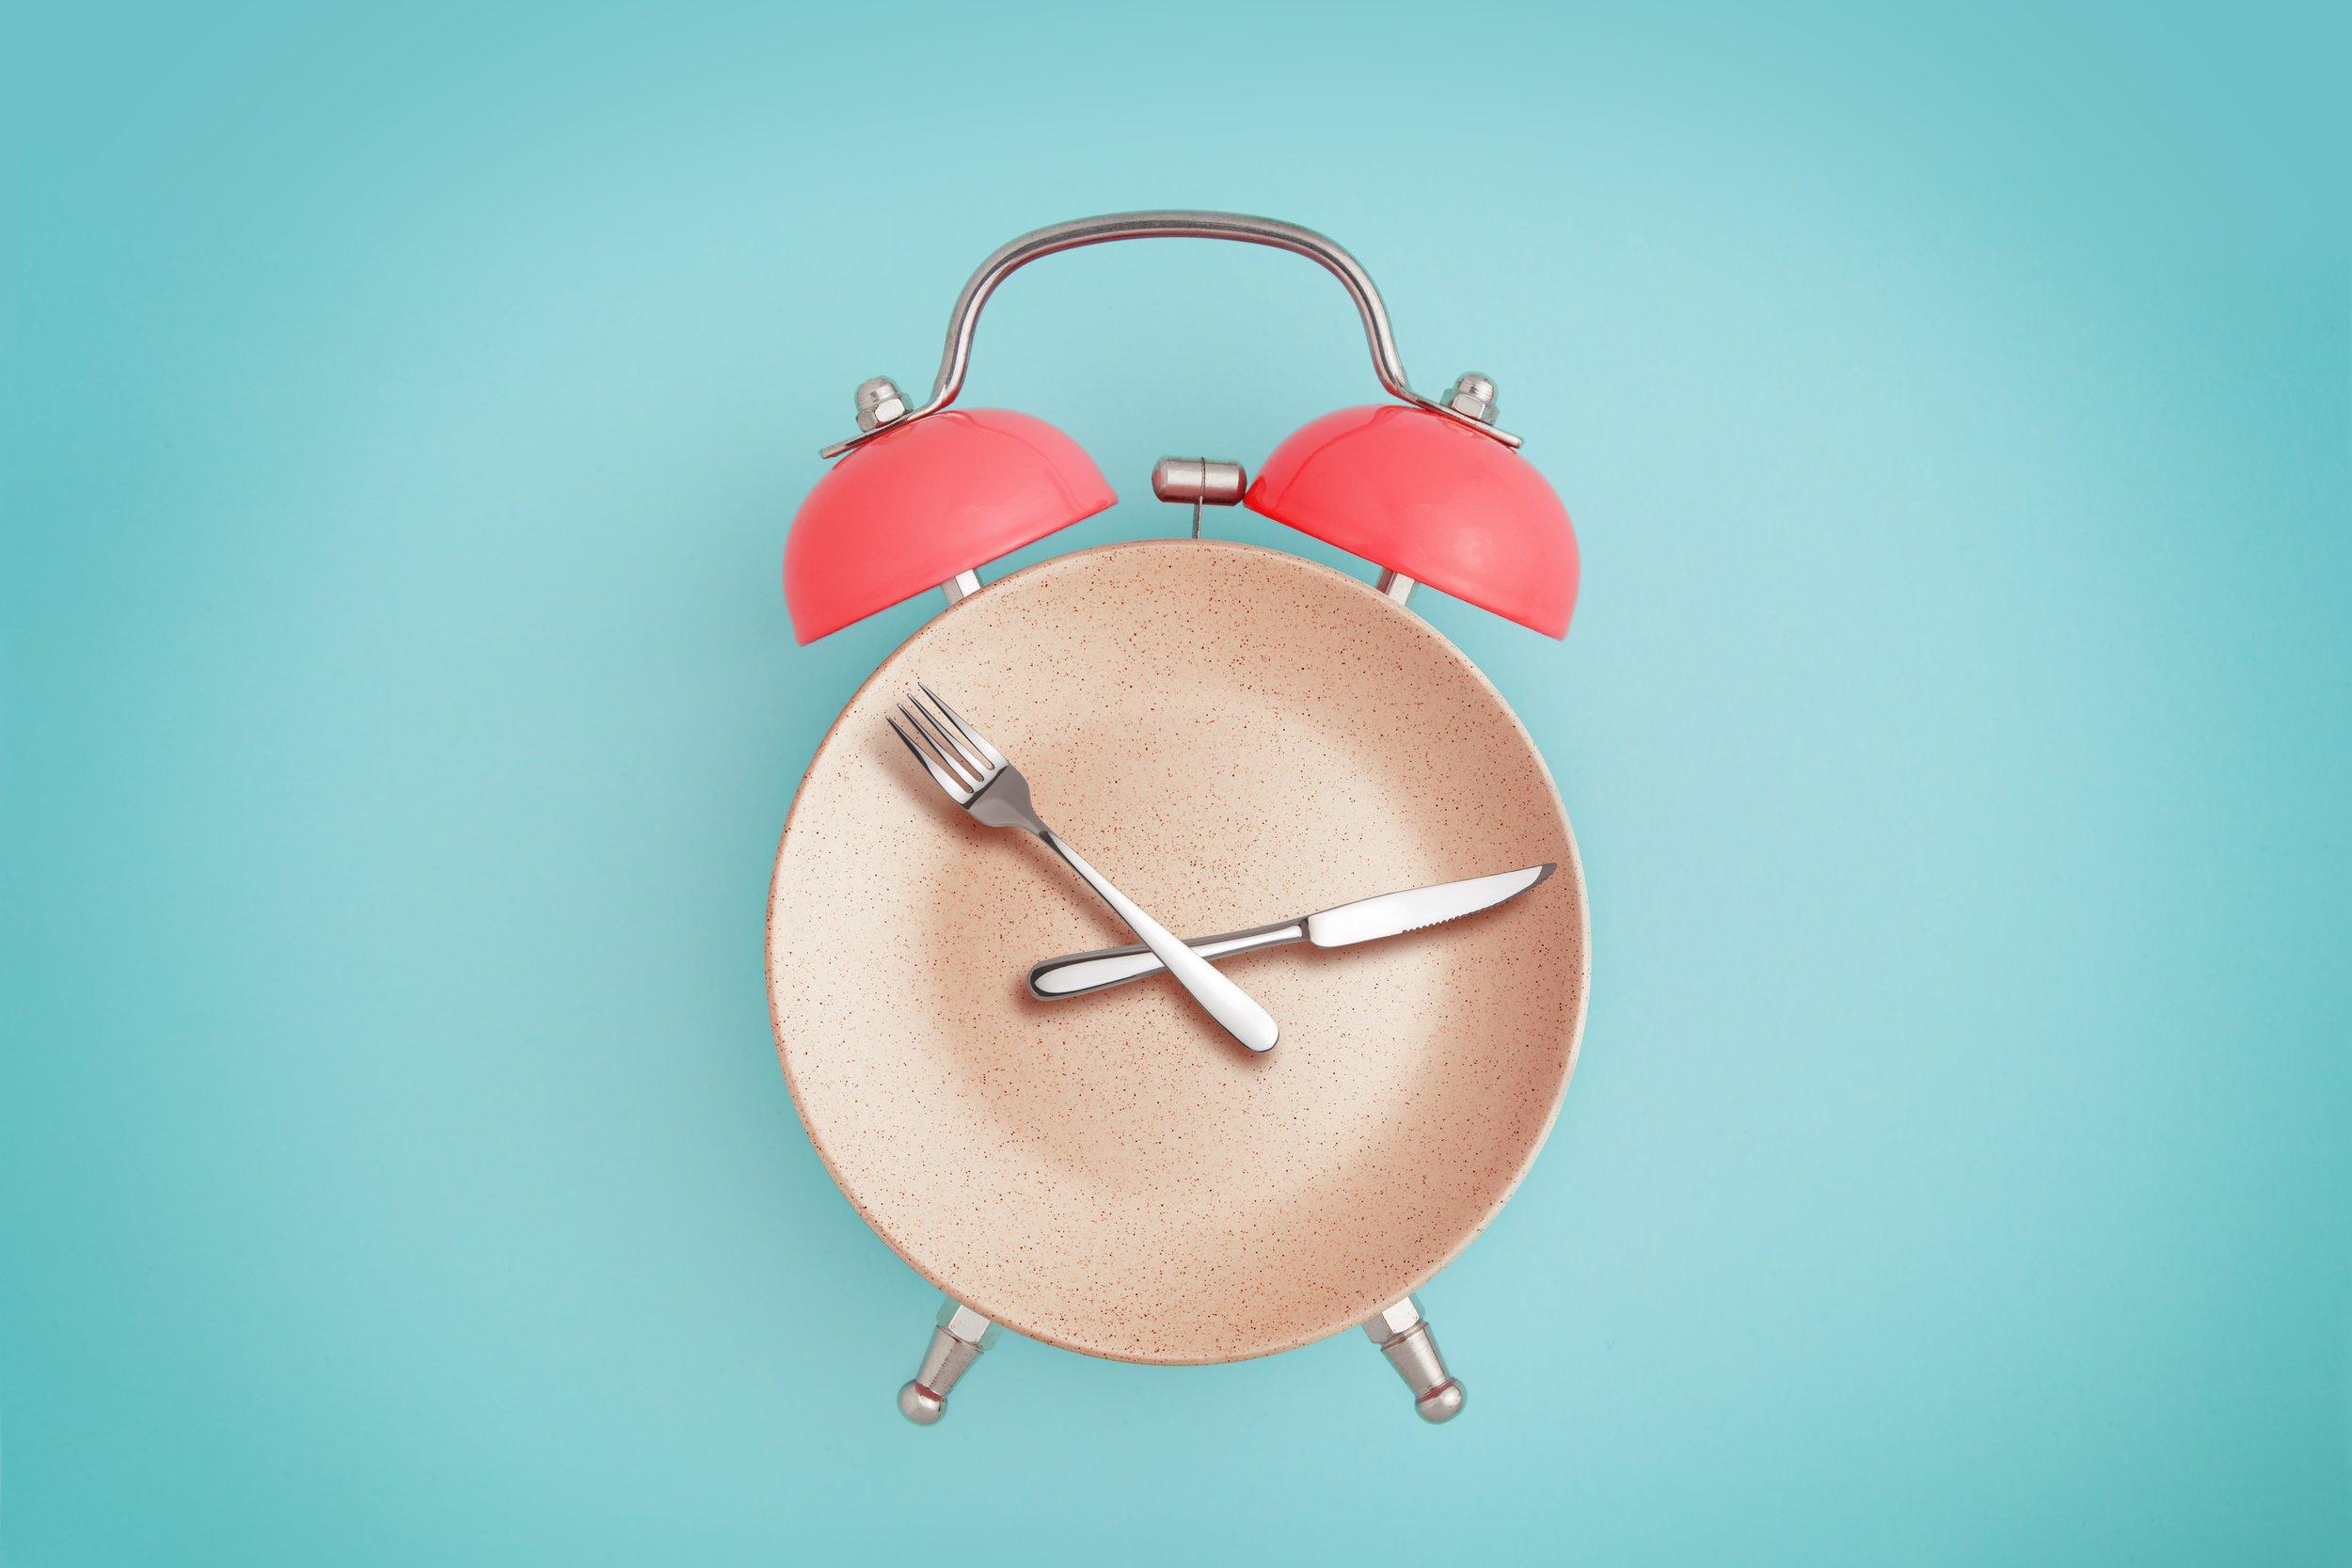 intermittent fasting clock.jpg